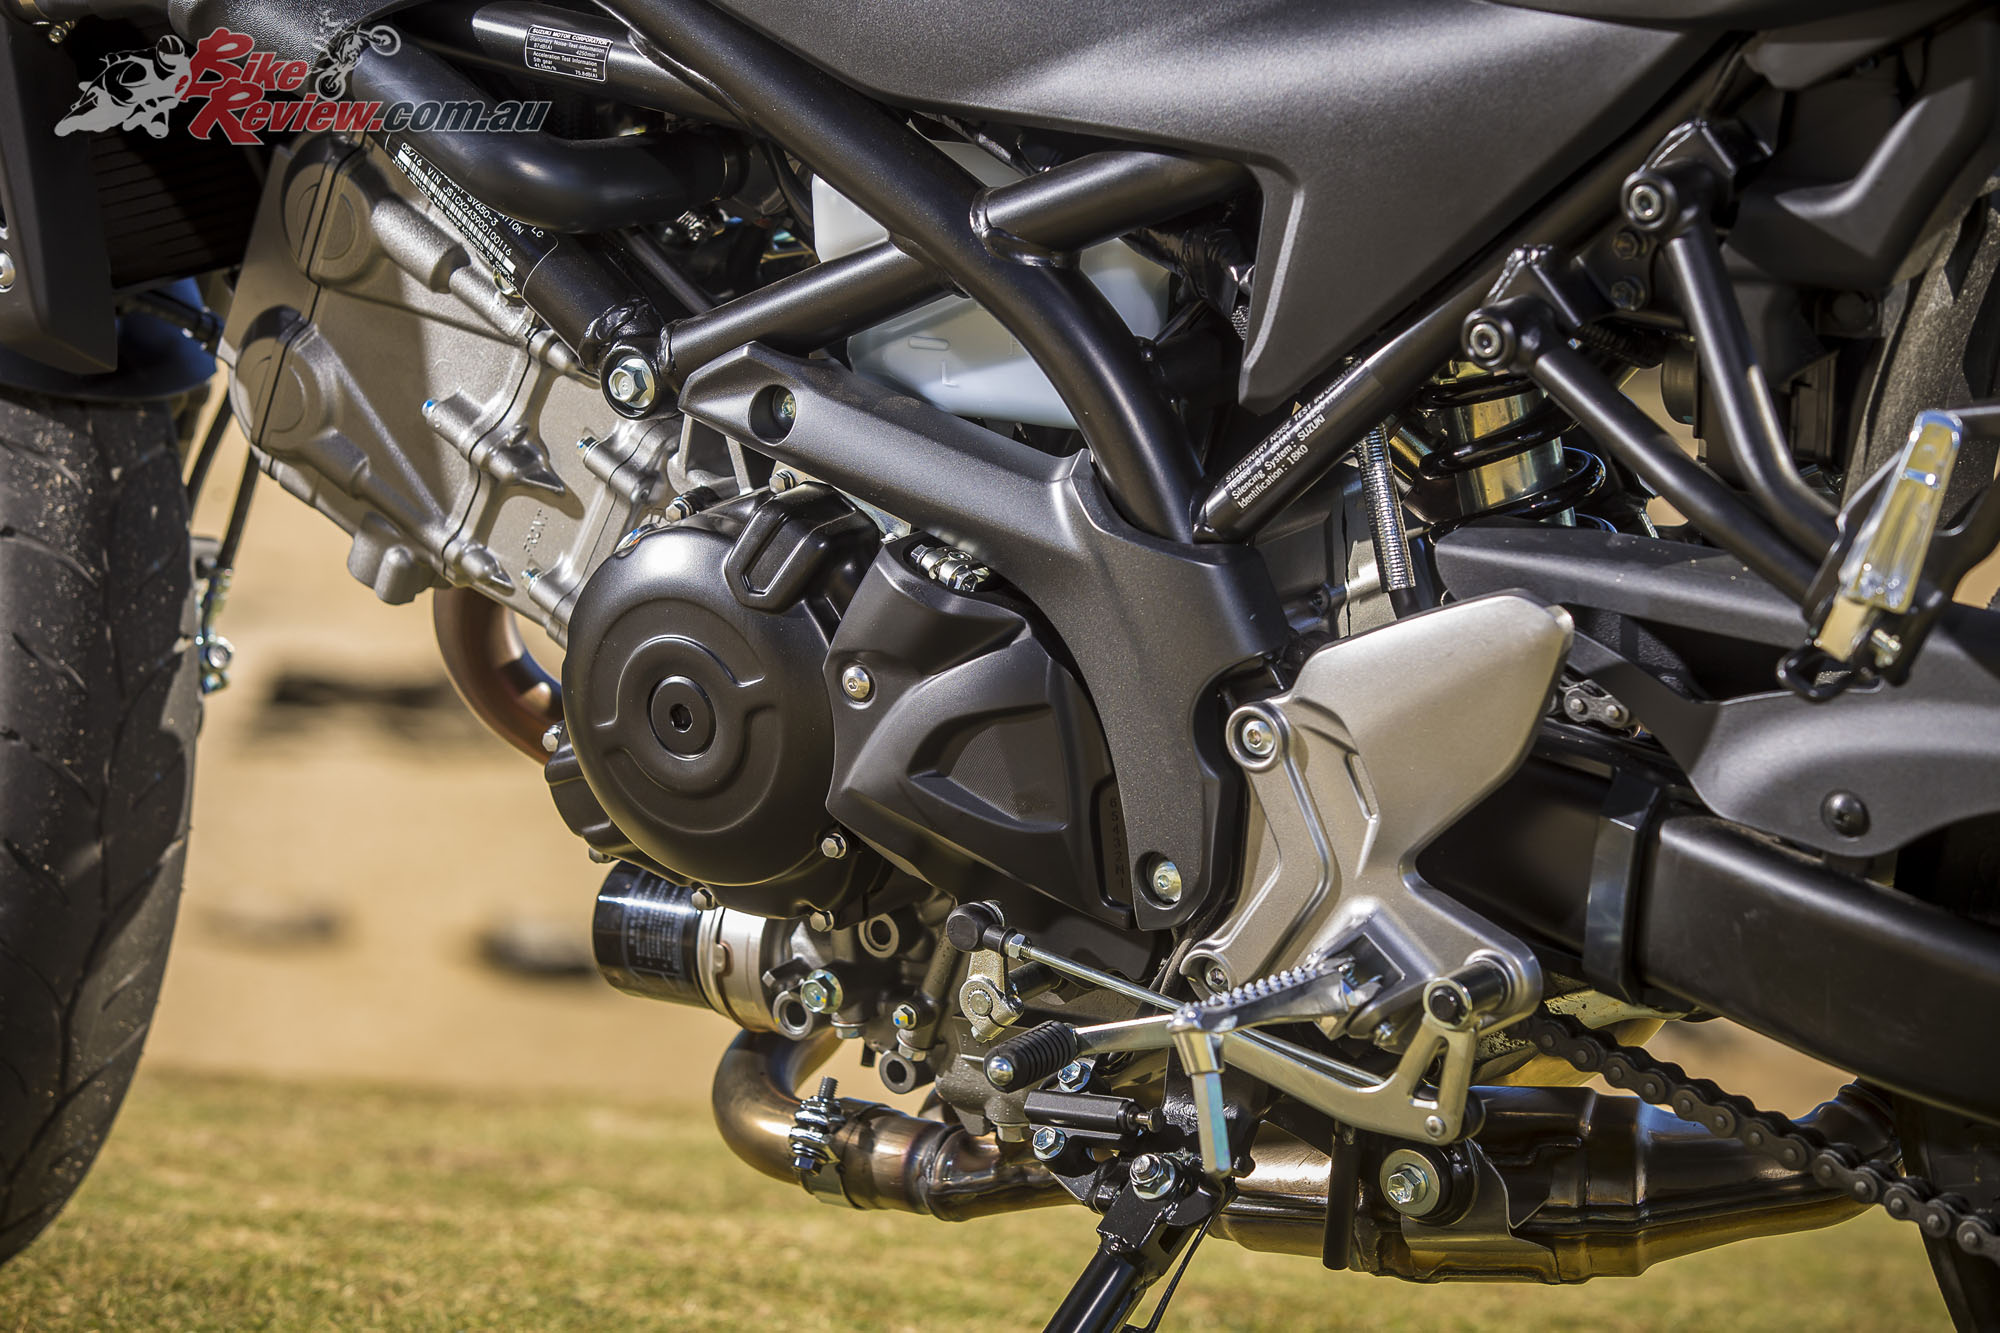 Review: 2019 Suzuki SV650X 'Cafe Racer' - Bike Review